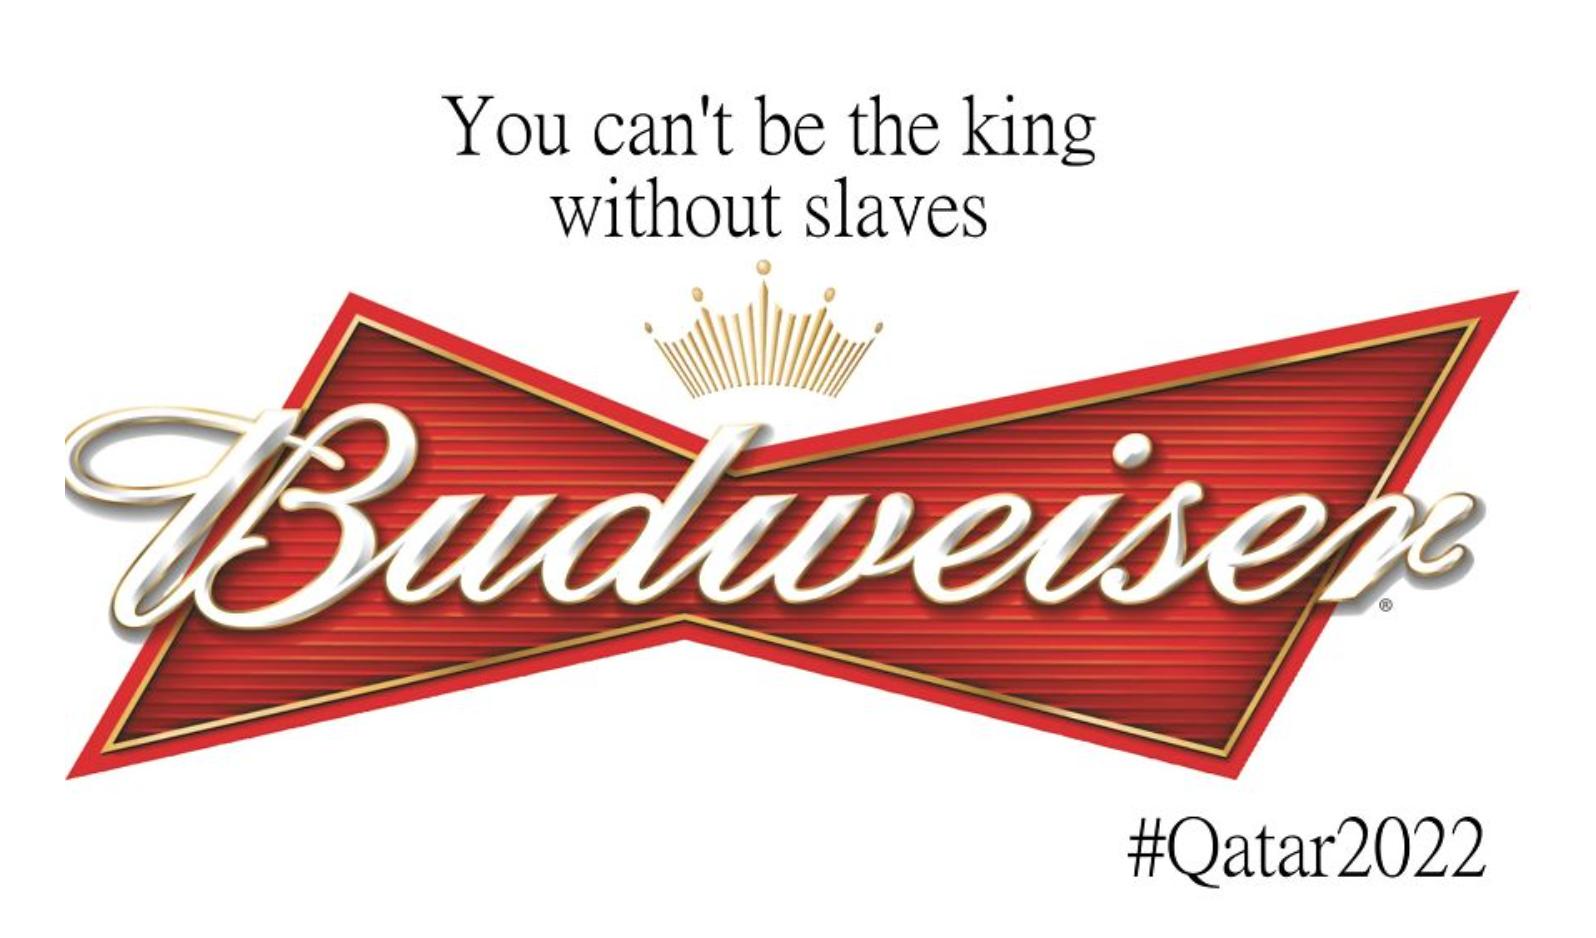 Budweiser king of slaves